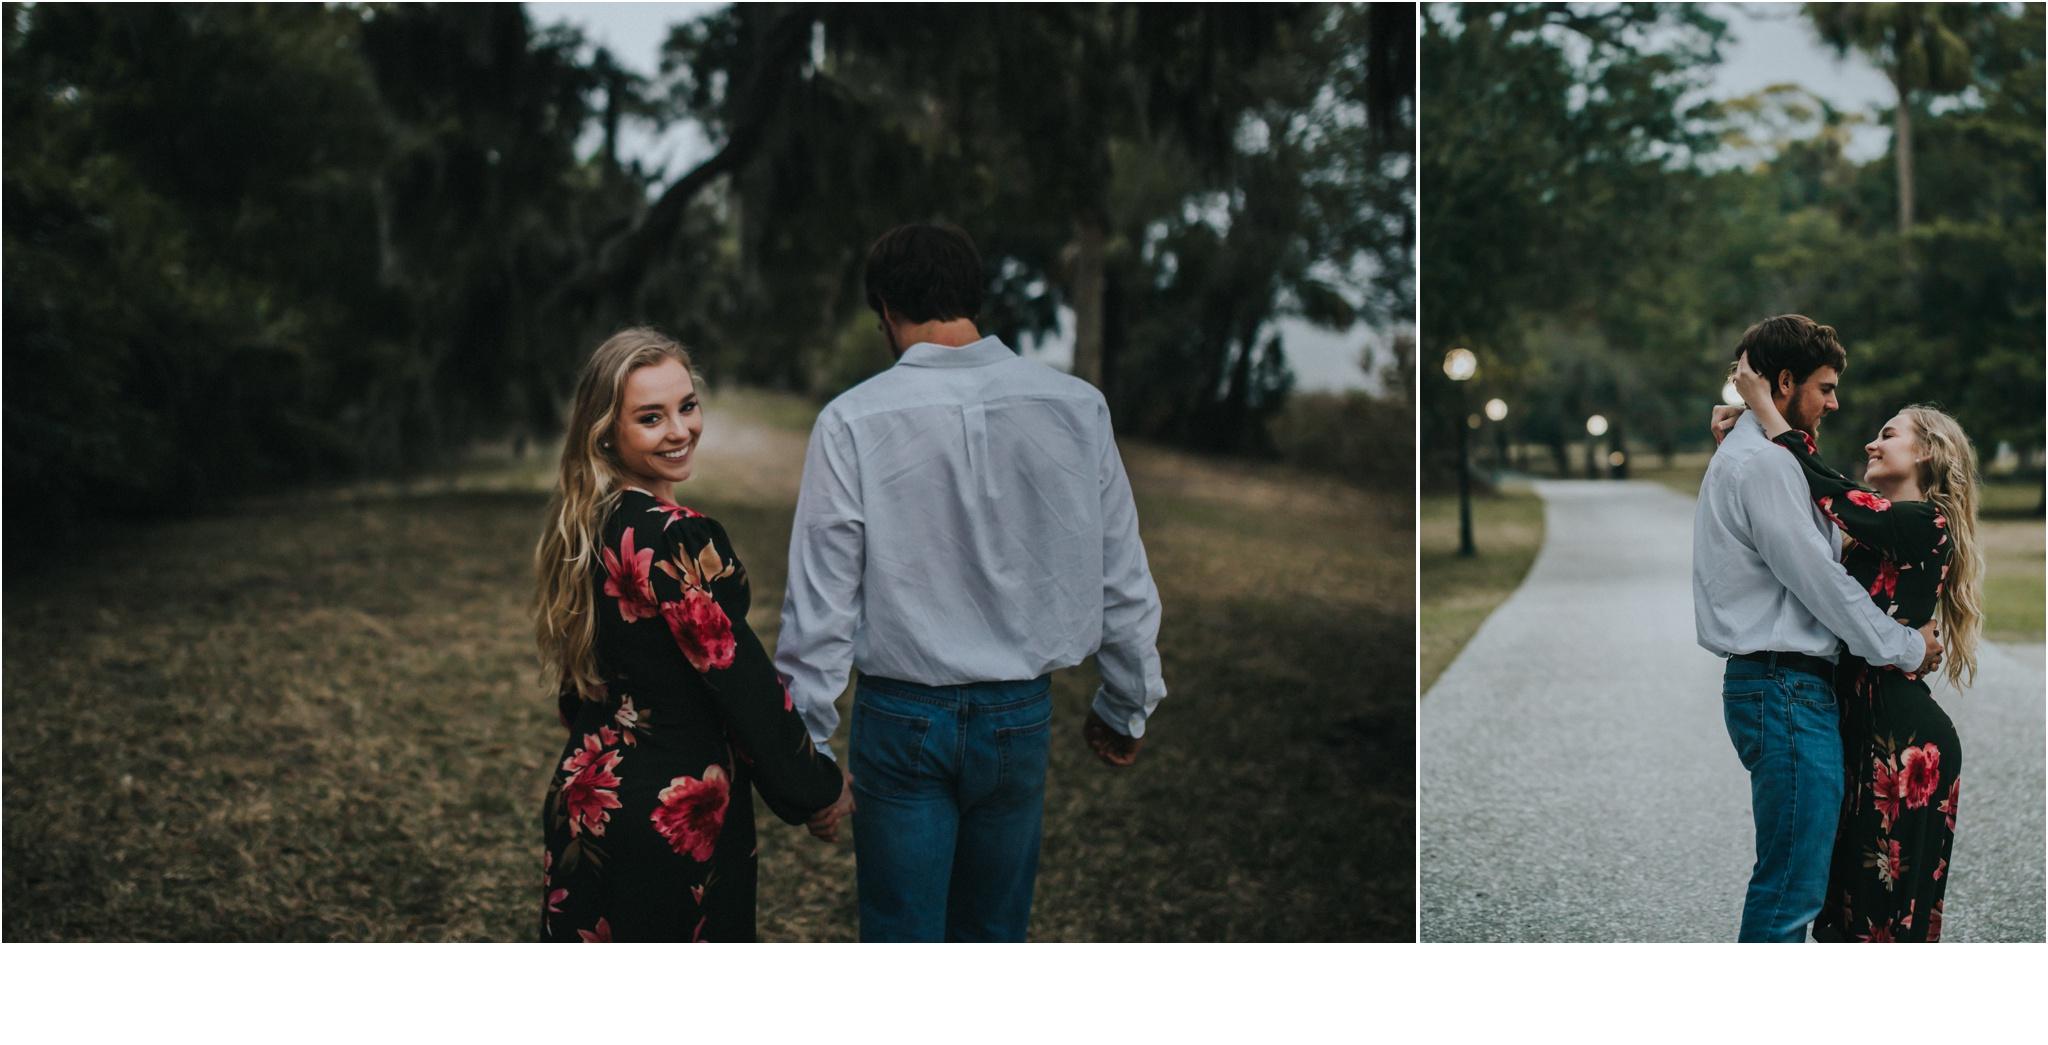 Rainey_Gregg_Photography_St._Simons_Island_Georgia_California_Wedding_Portrait_Photography_0699.jpg